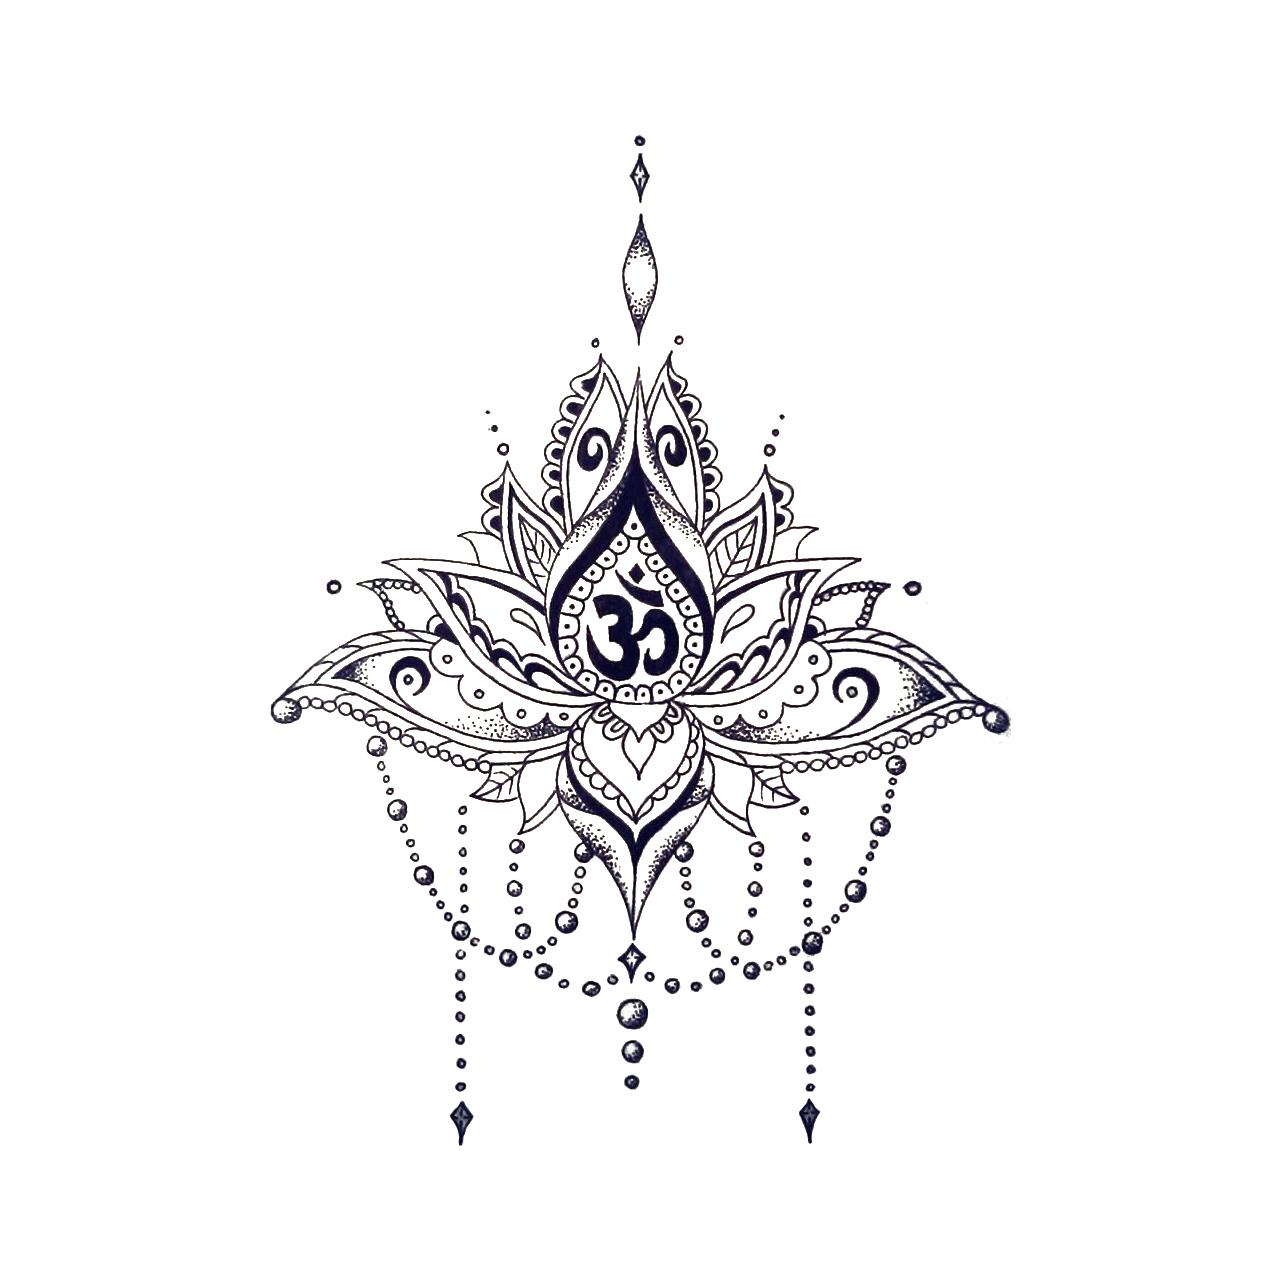 All Tattoo Designs Archives Tatouage Om Tatouage De Lotus Tatouage Texte